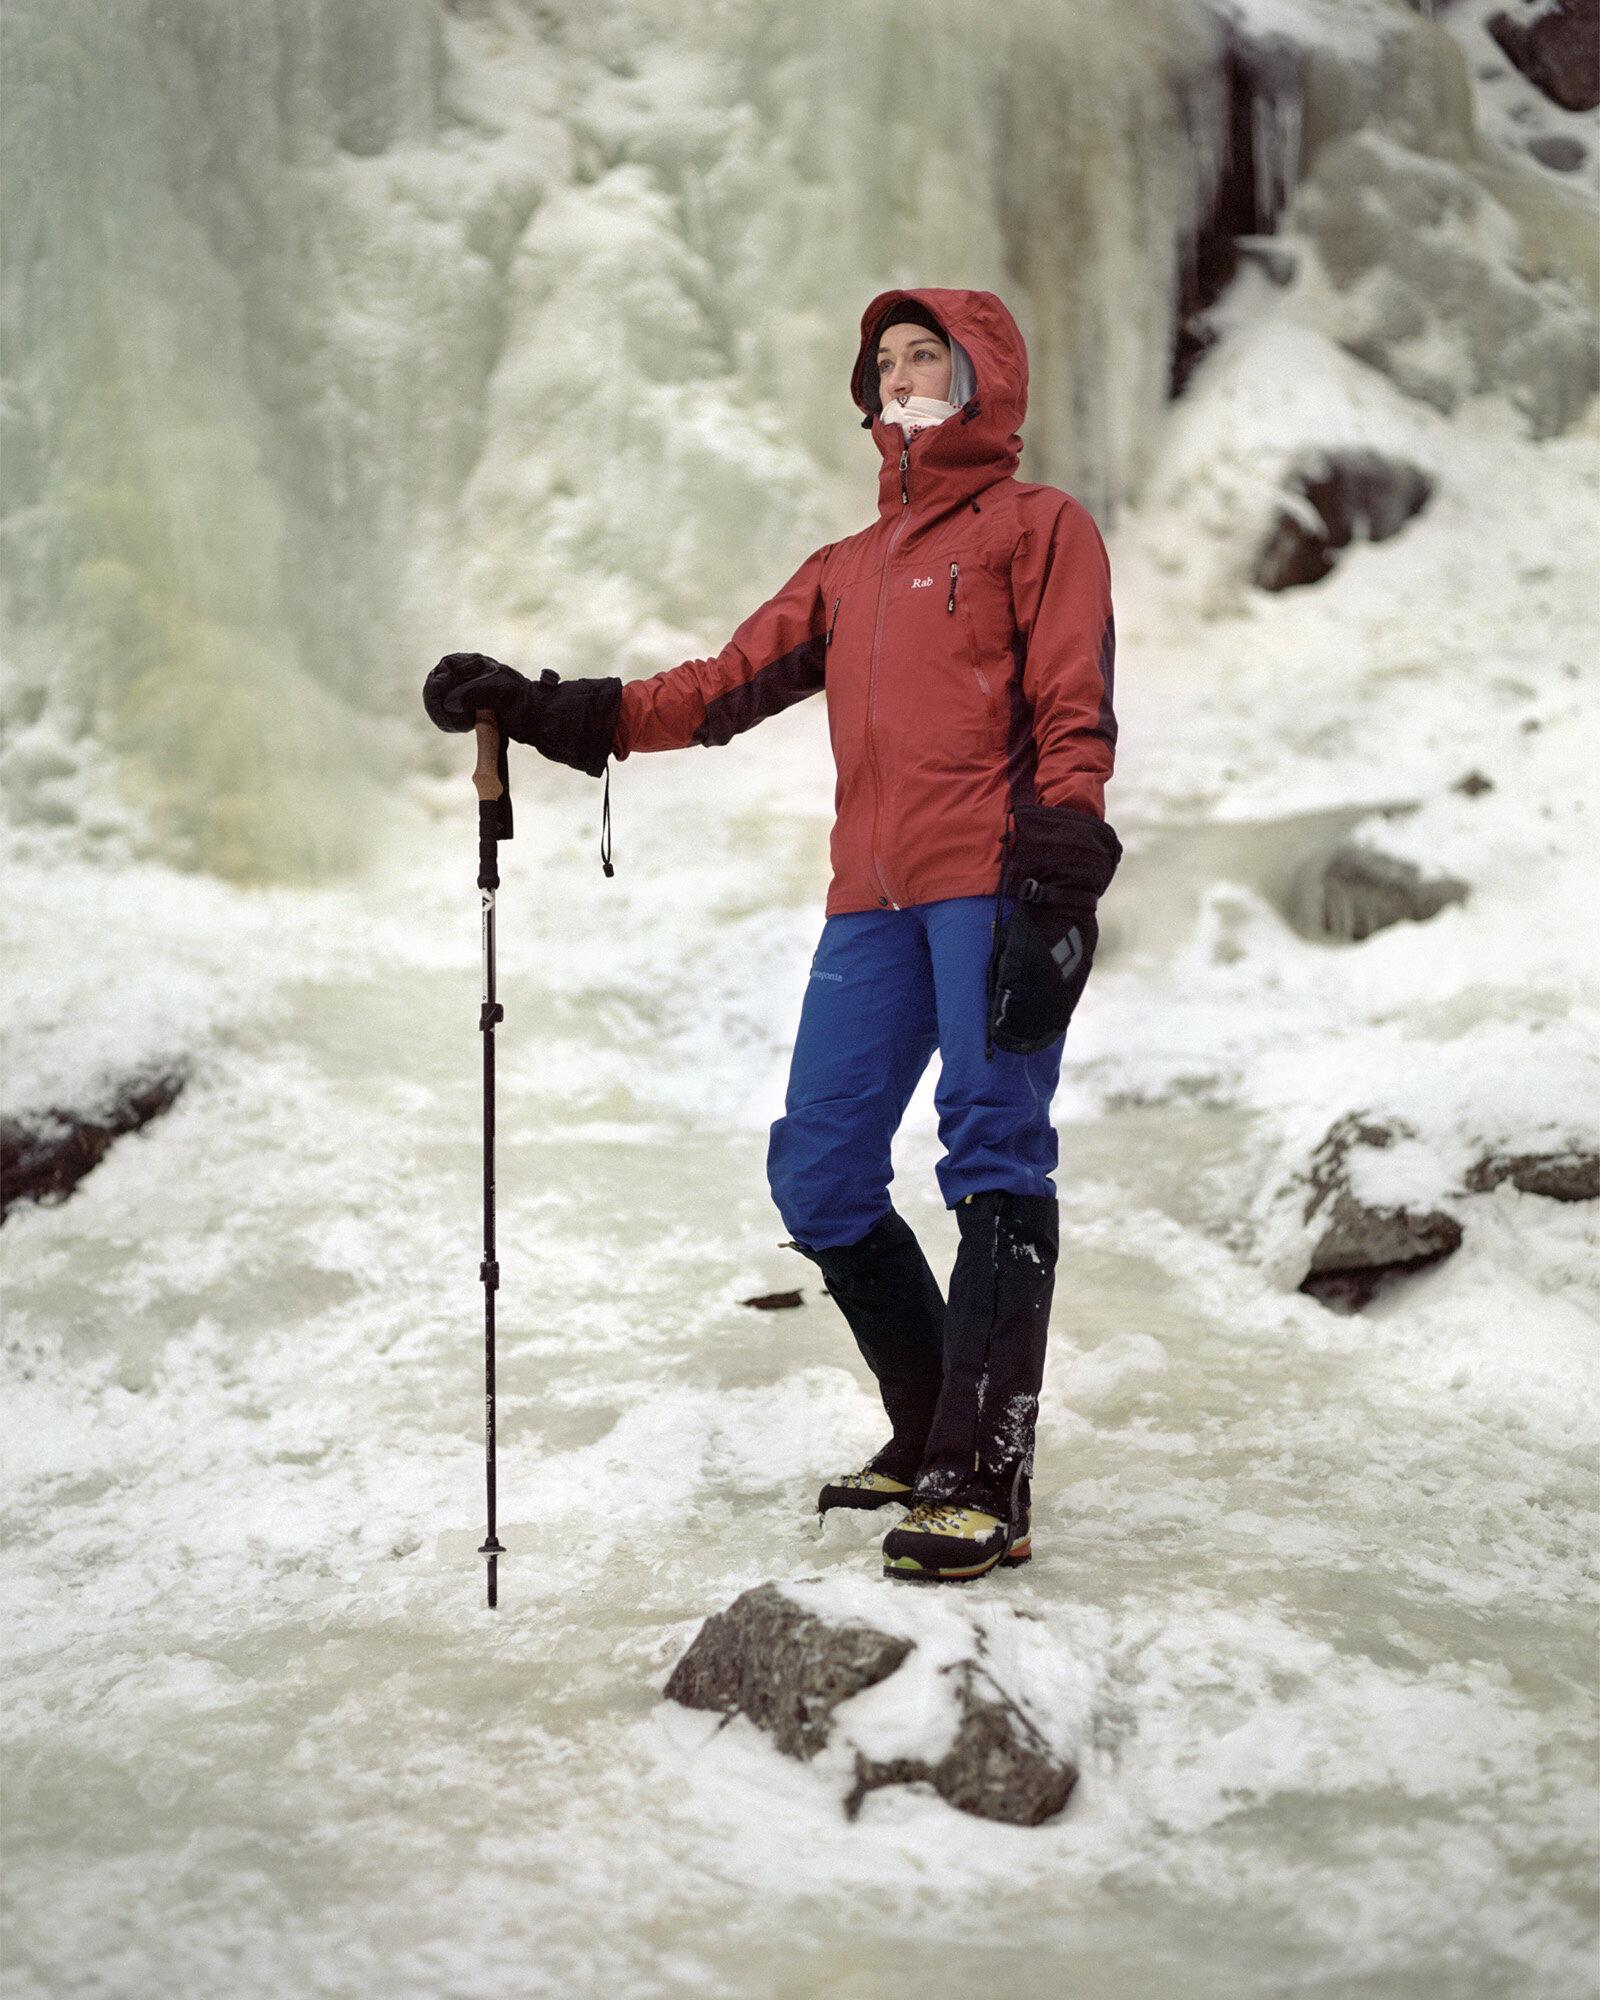 Miska_Draskoczy_Ice_Climbers_Mina.jpg